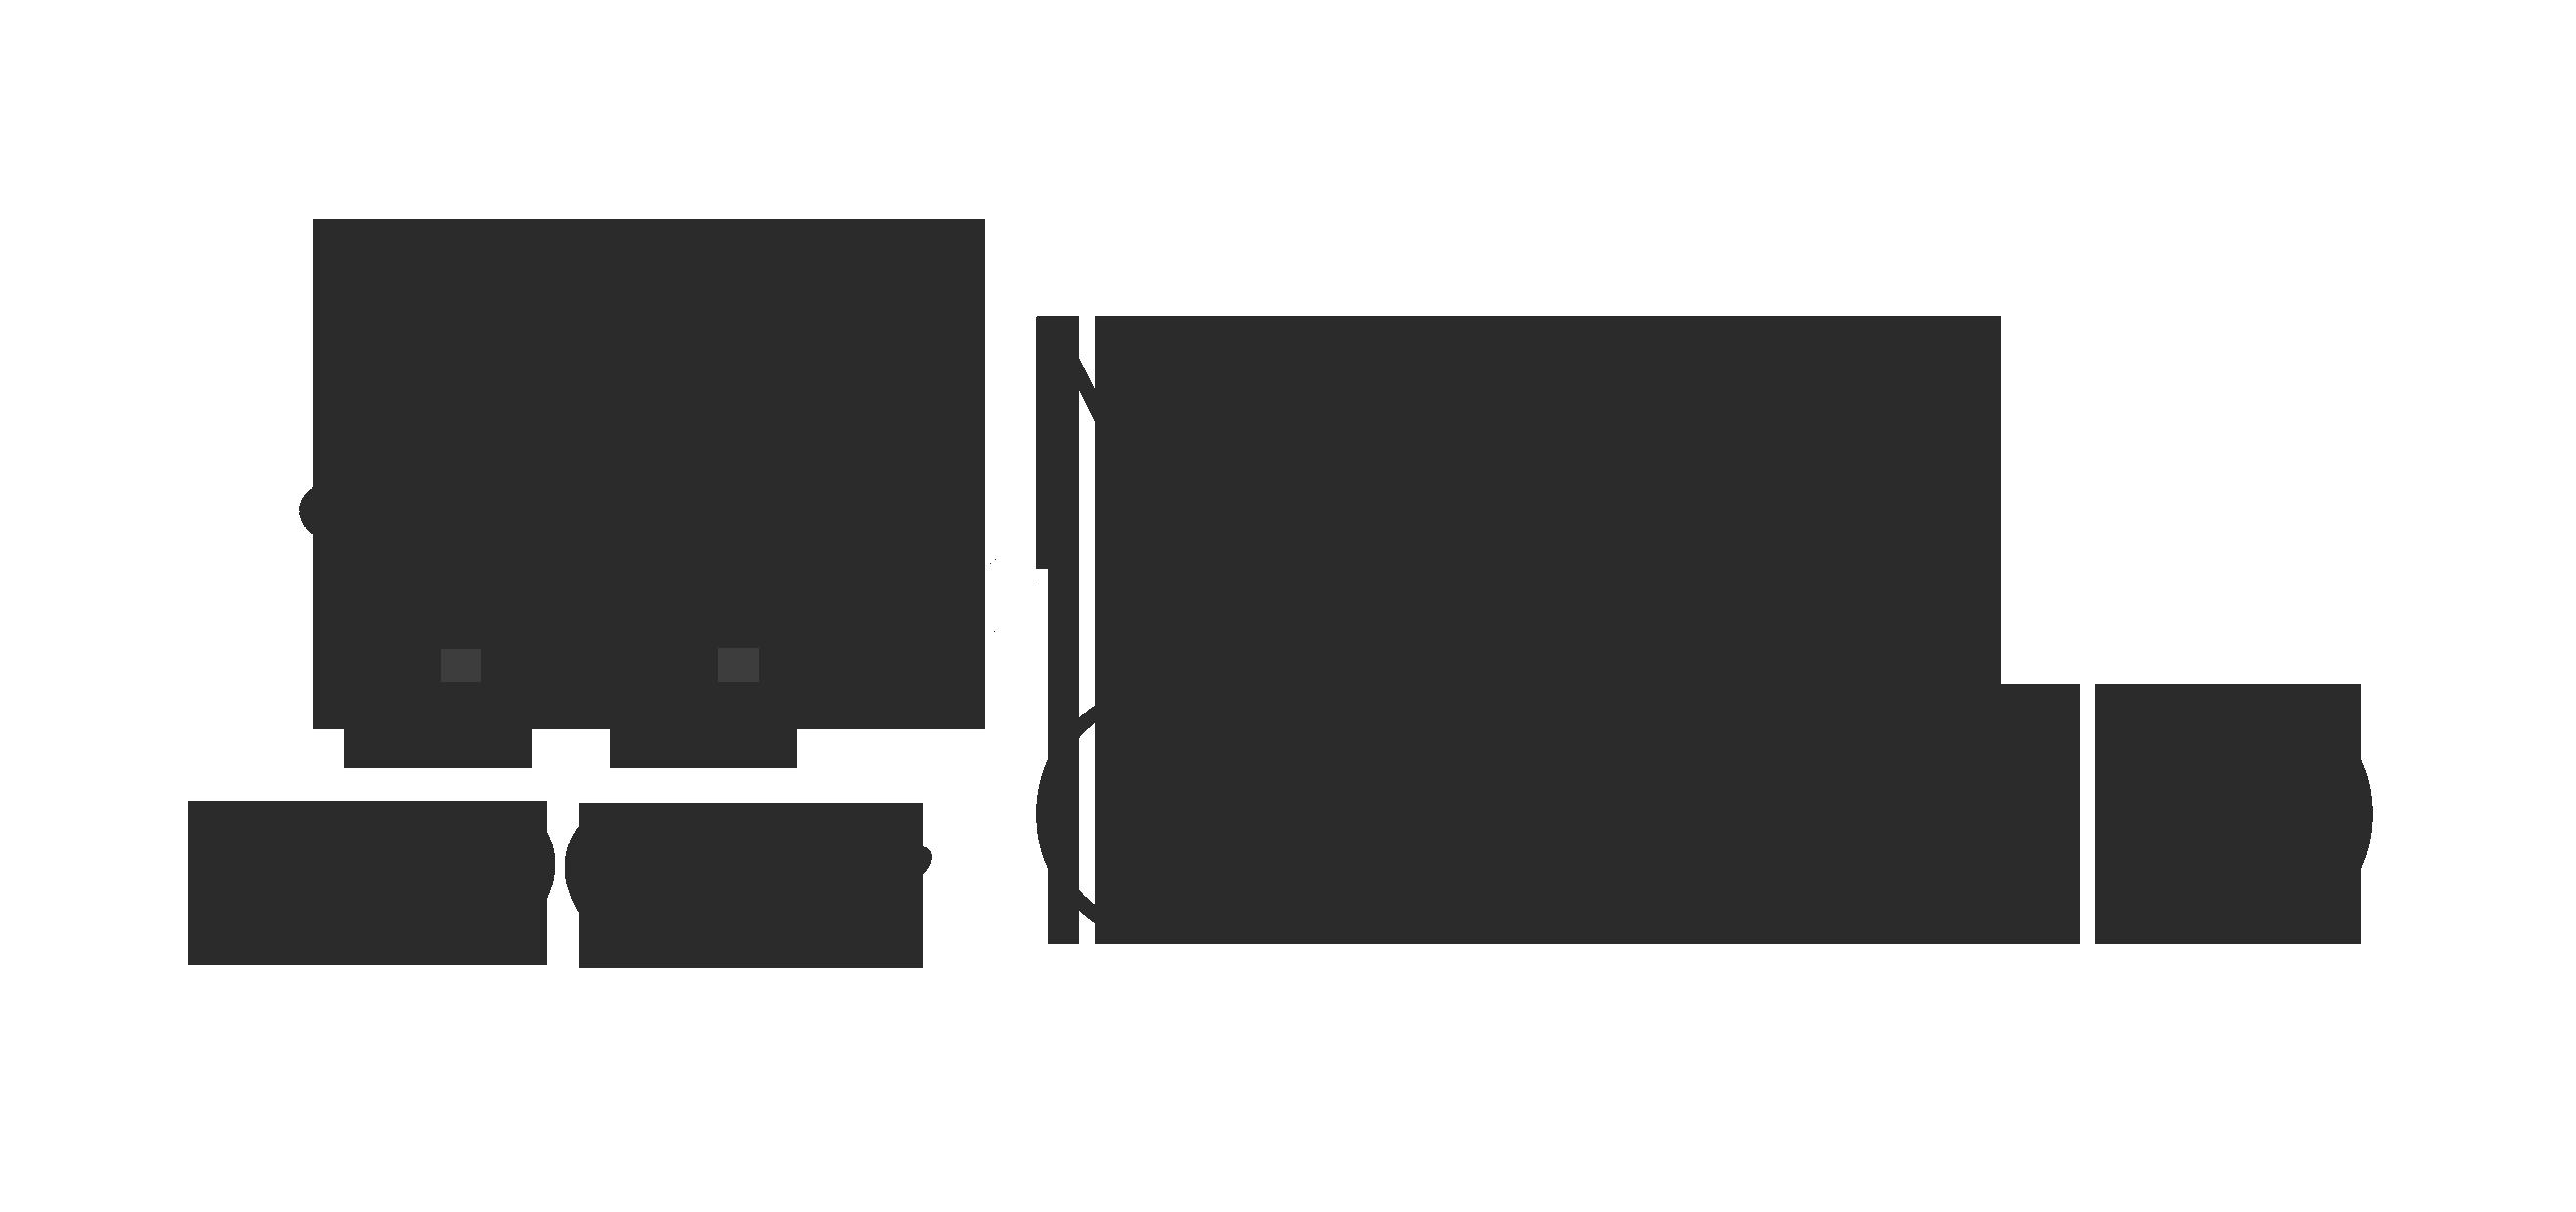 Mrcrooq